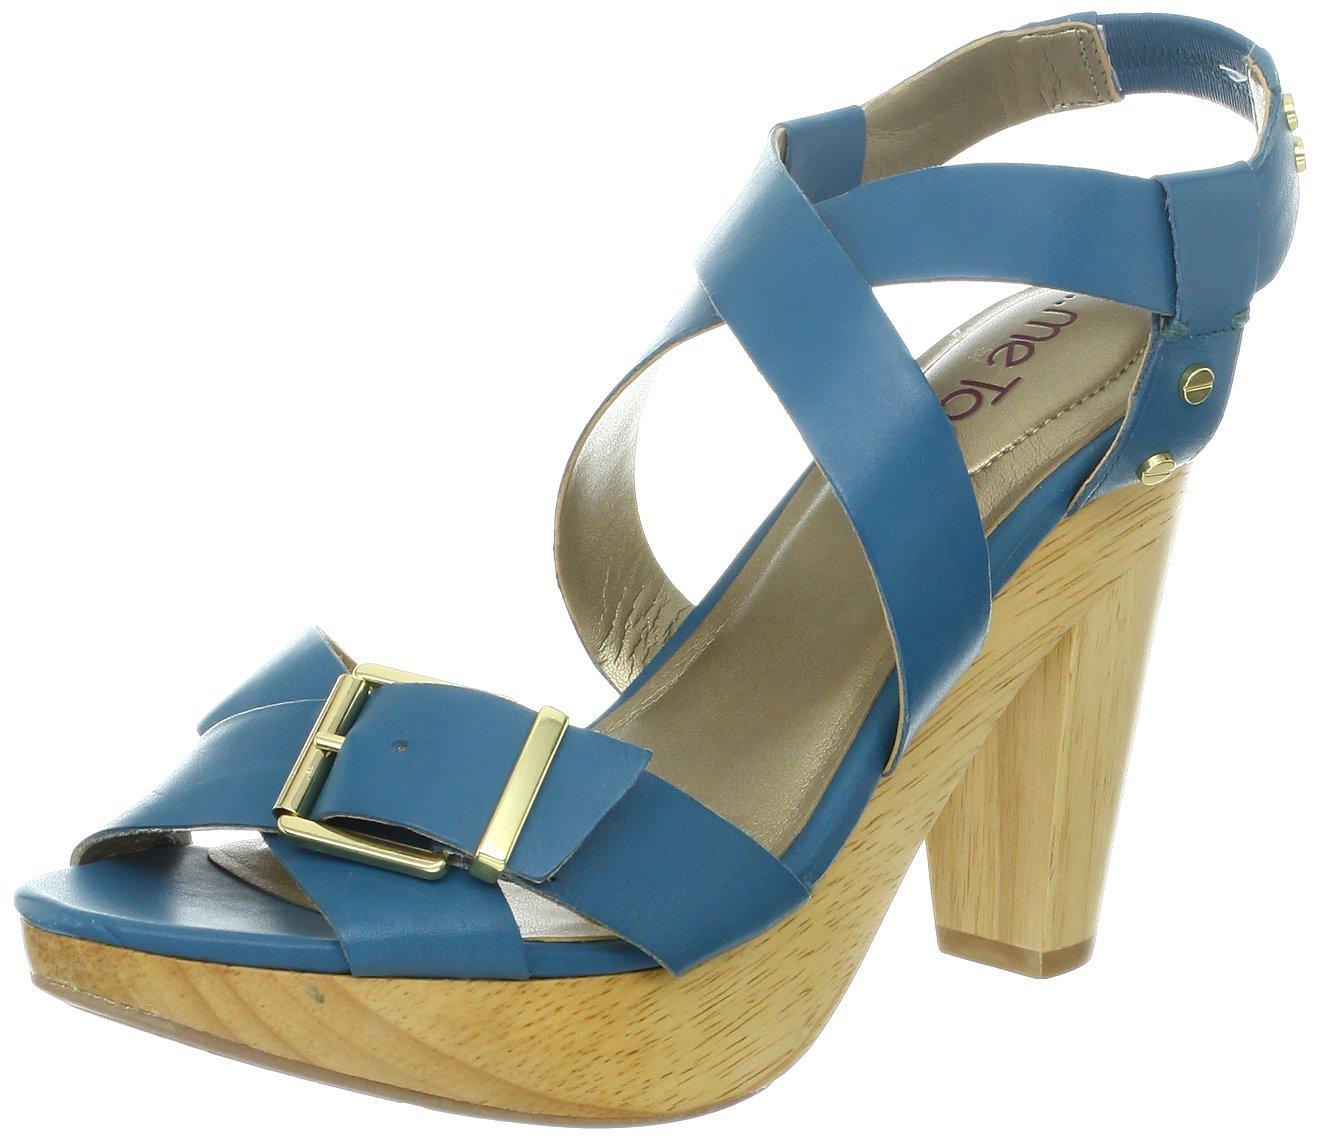 Me Too Women's Ebony Platform Sandal B009OAO5IA 8.5 B(M) US|Azure Blue